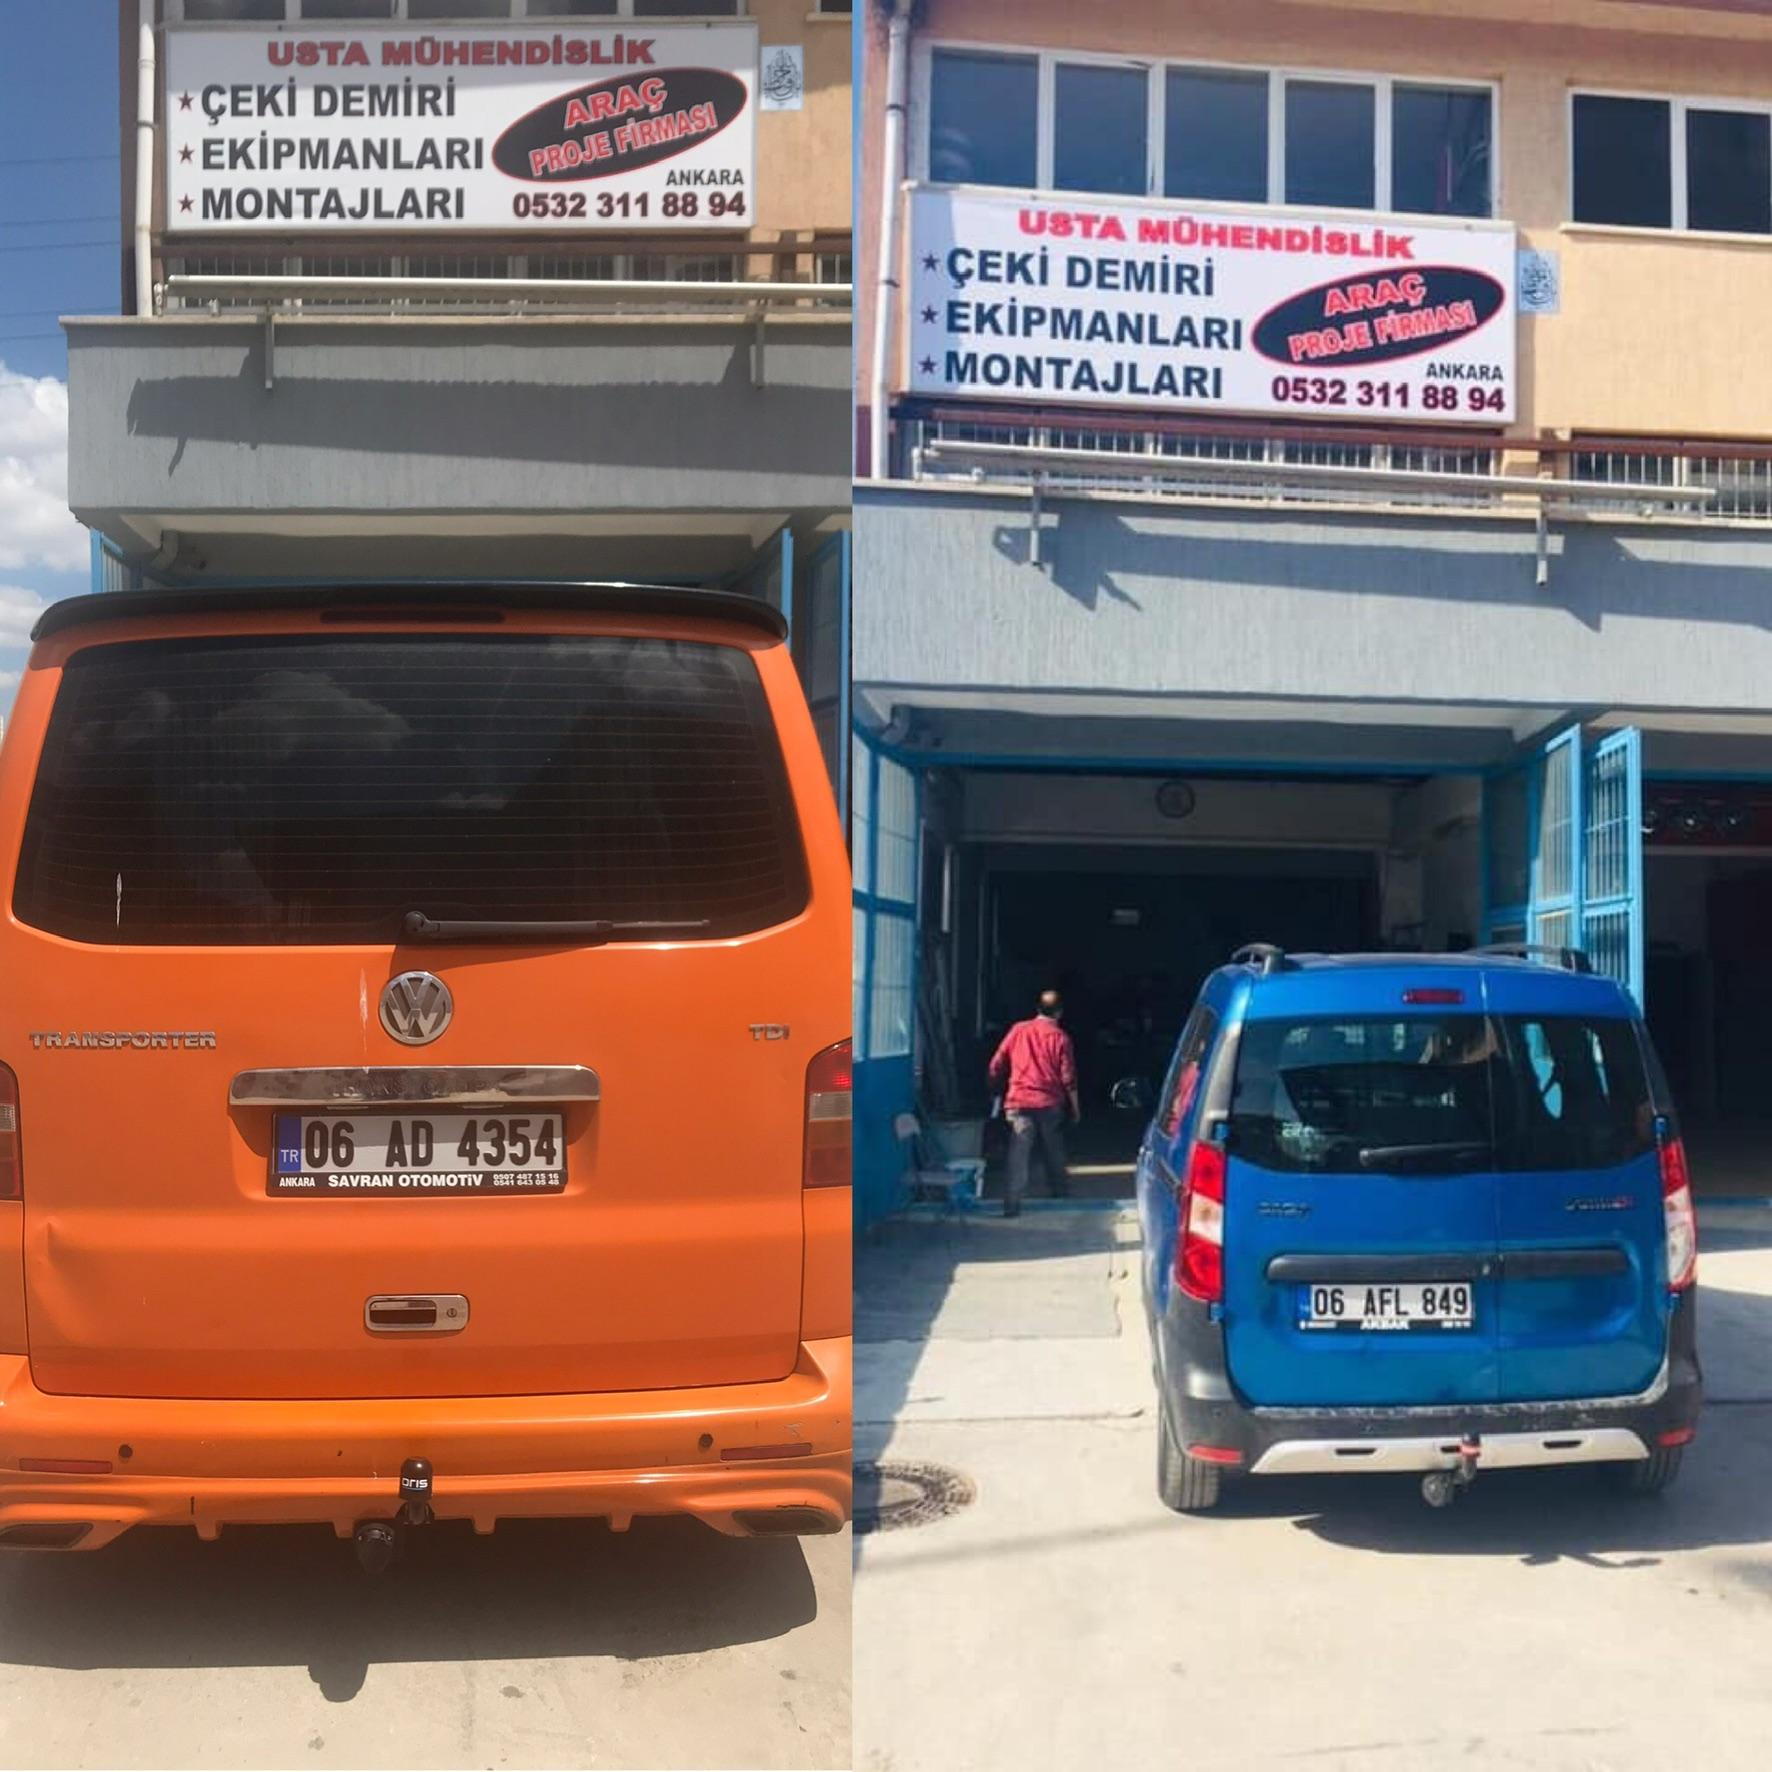 VOLKSWAGEN Transporter T5-T6 *ÇEKİ DEMİRİ MONTAJI +ARAÇ PROJE FİRMASI ANKARA